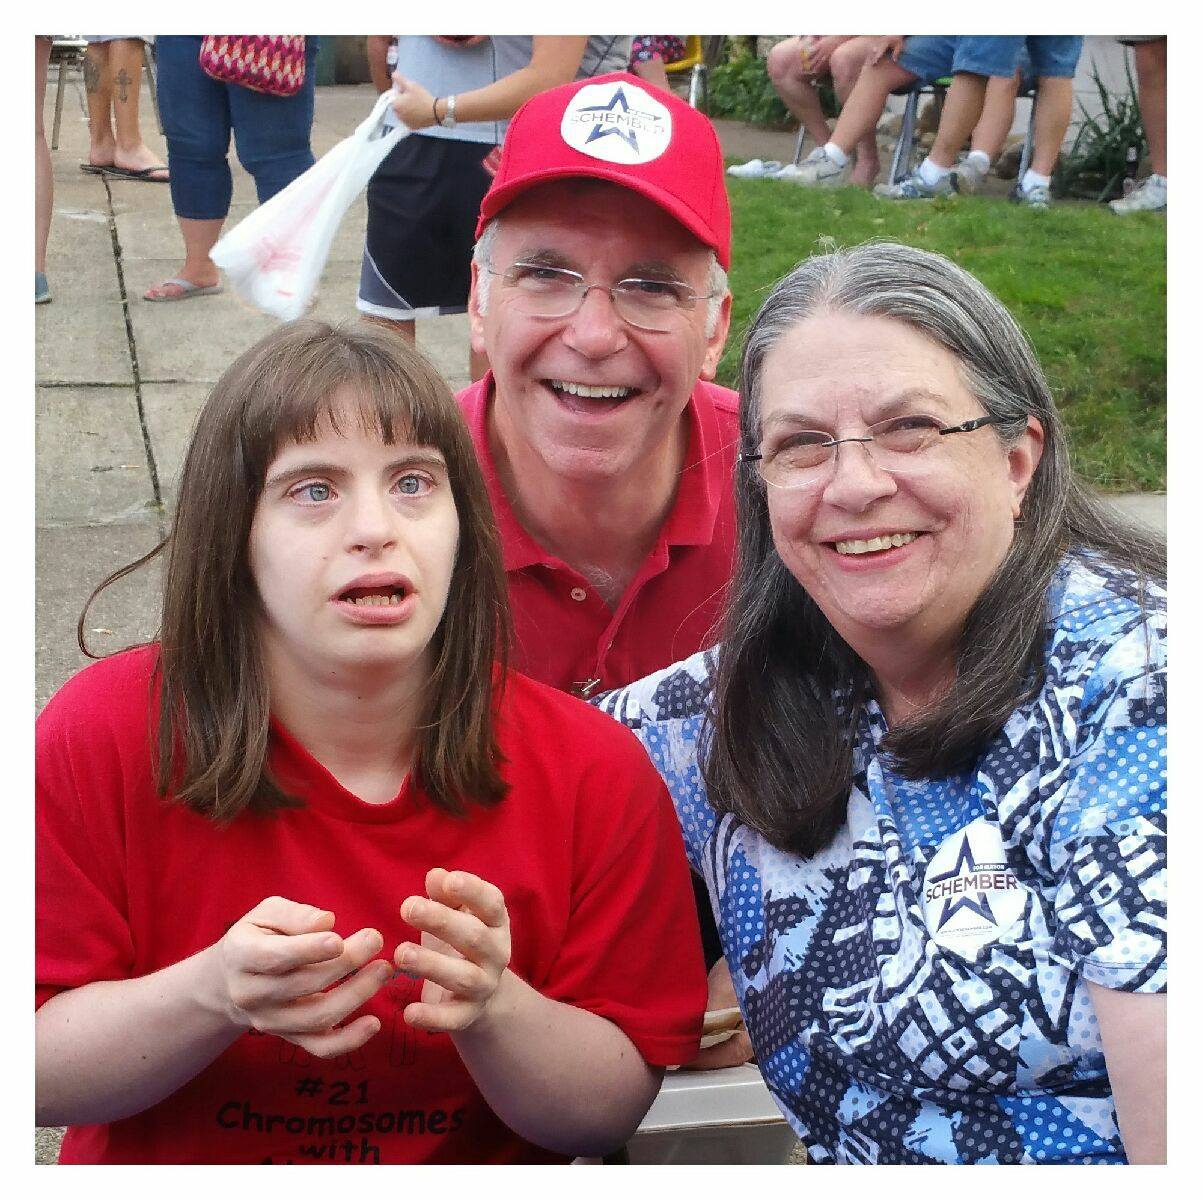 Joe & Rhonda with their daughter, Jodi, enjoying Zabawa Polish Festival.